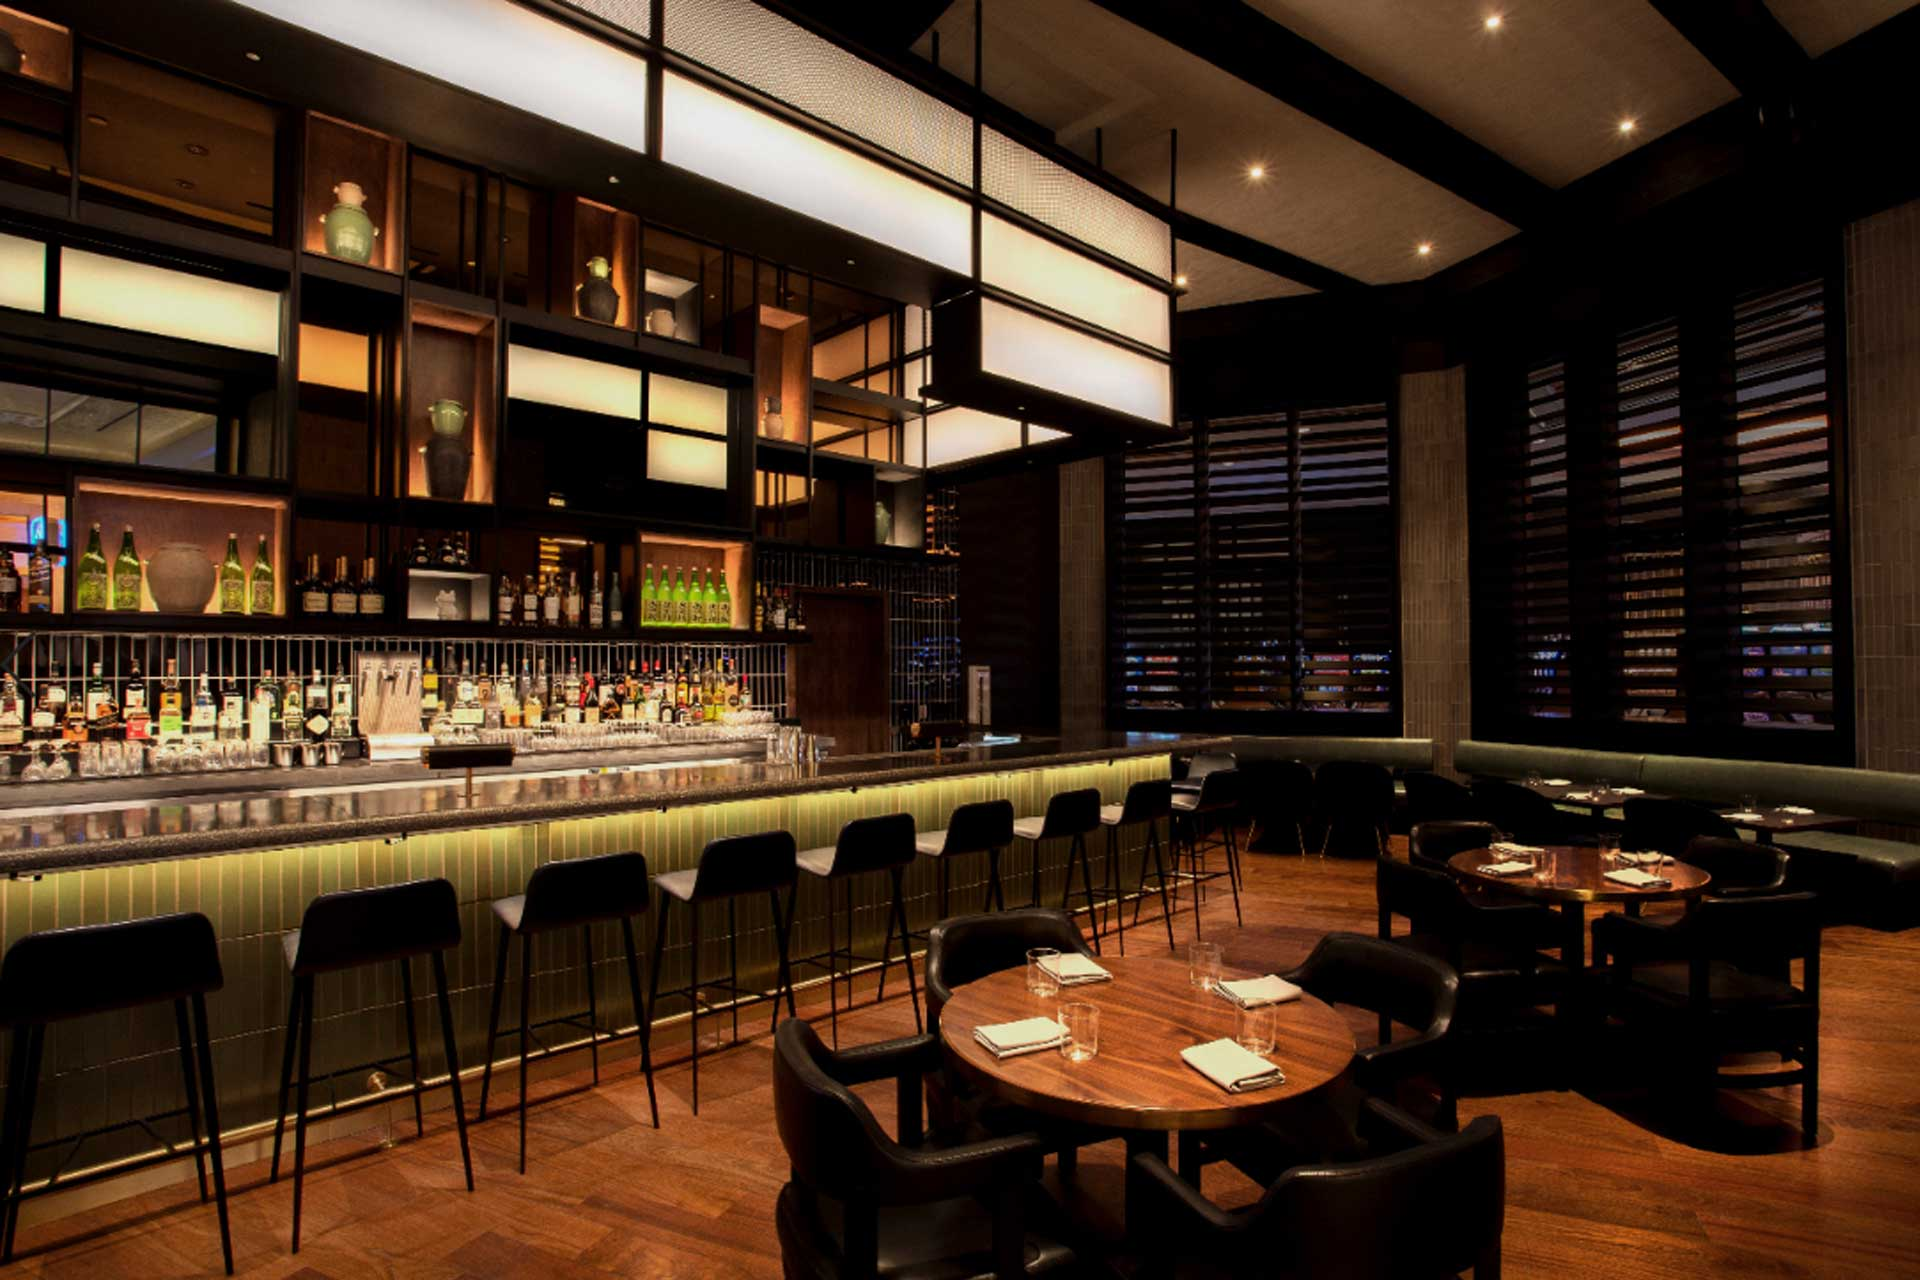 DesignAgency has designed the Las Vegas debut of Majordomo